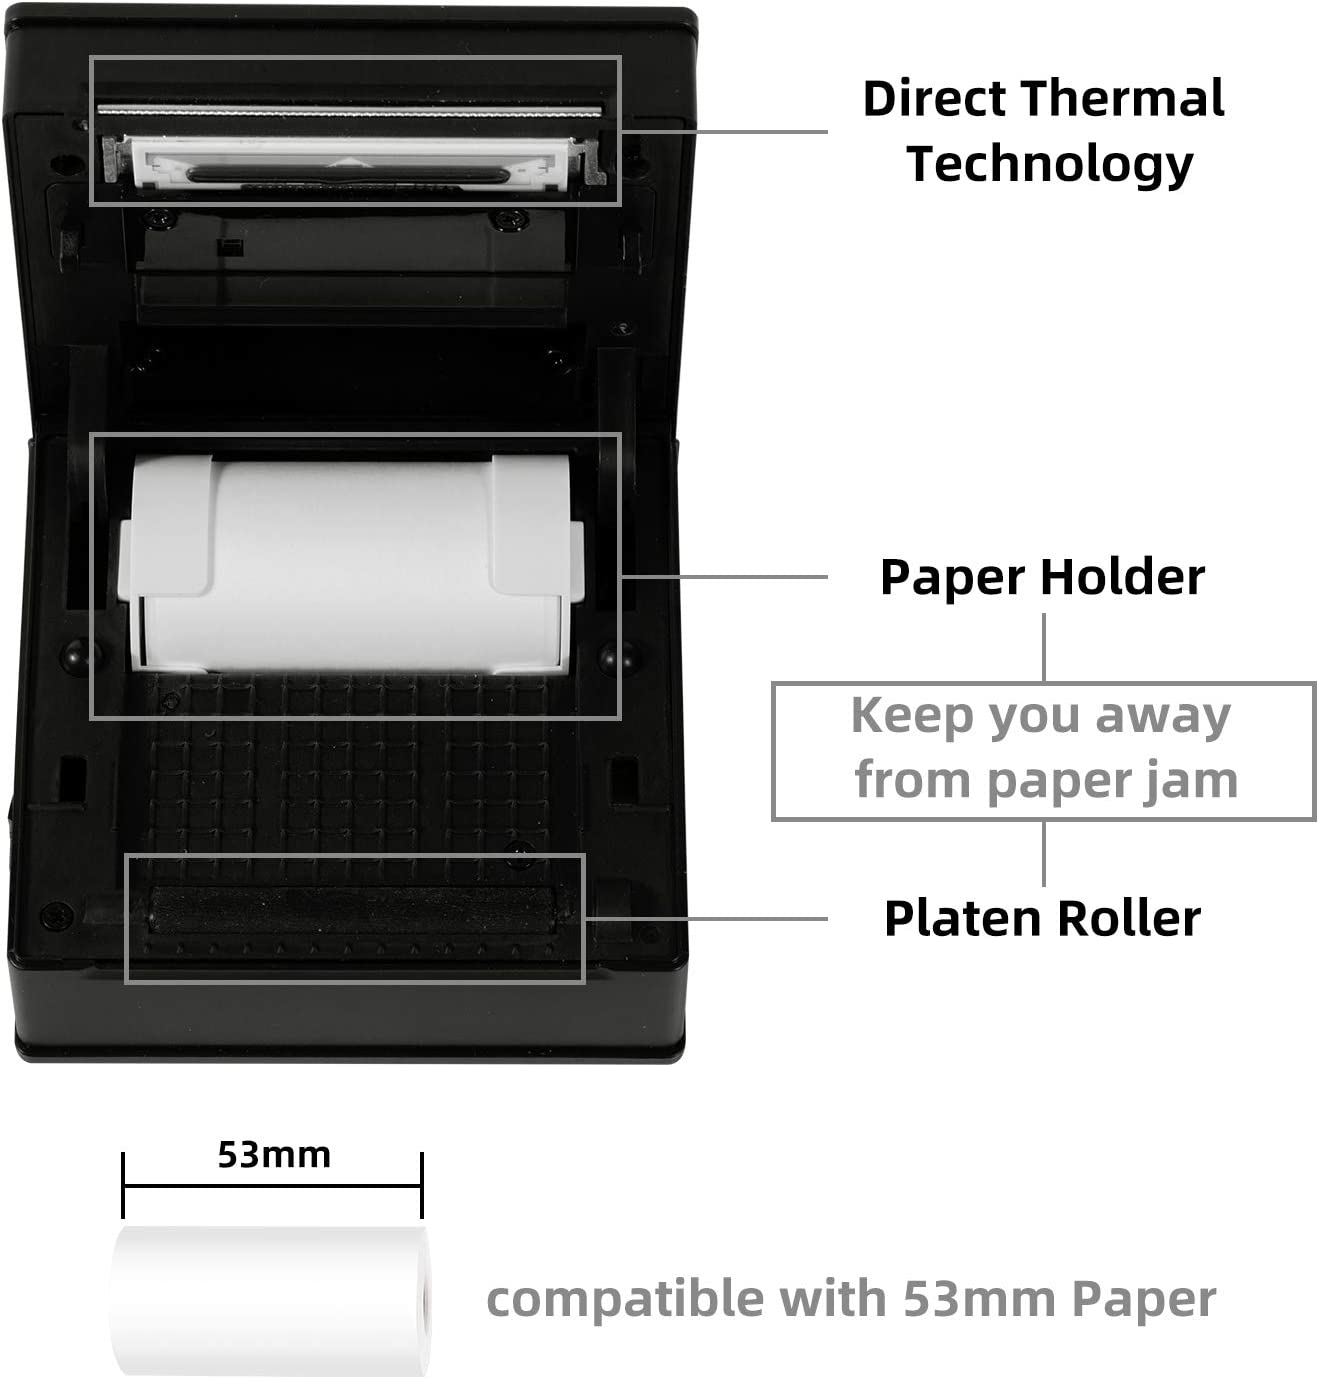 Journal Ice Cream Green Portable Bluetooth Thermal Printer Sticker Printer Compatible with iOS DIY Phomemo M02 Mini Pocket Printer Study Notes Memorandum Android for Home Organizing